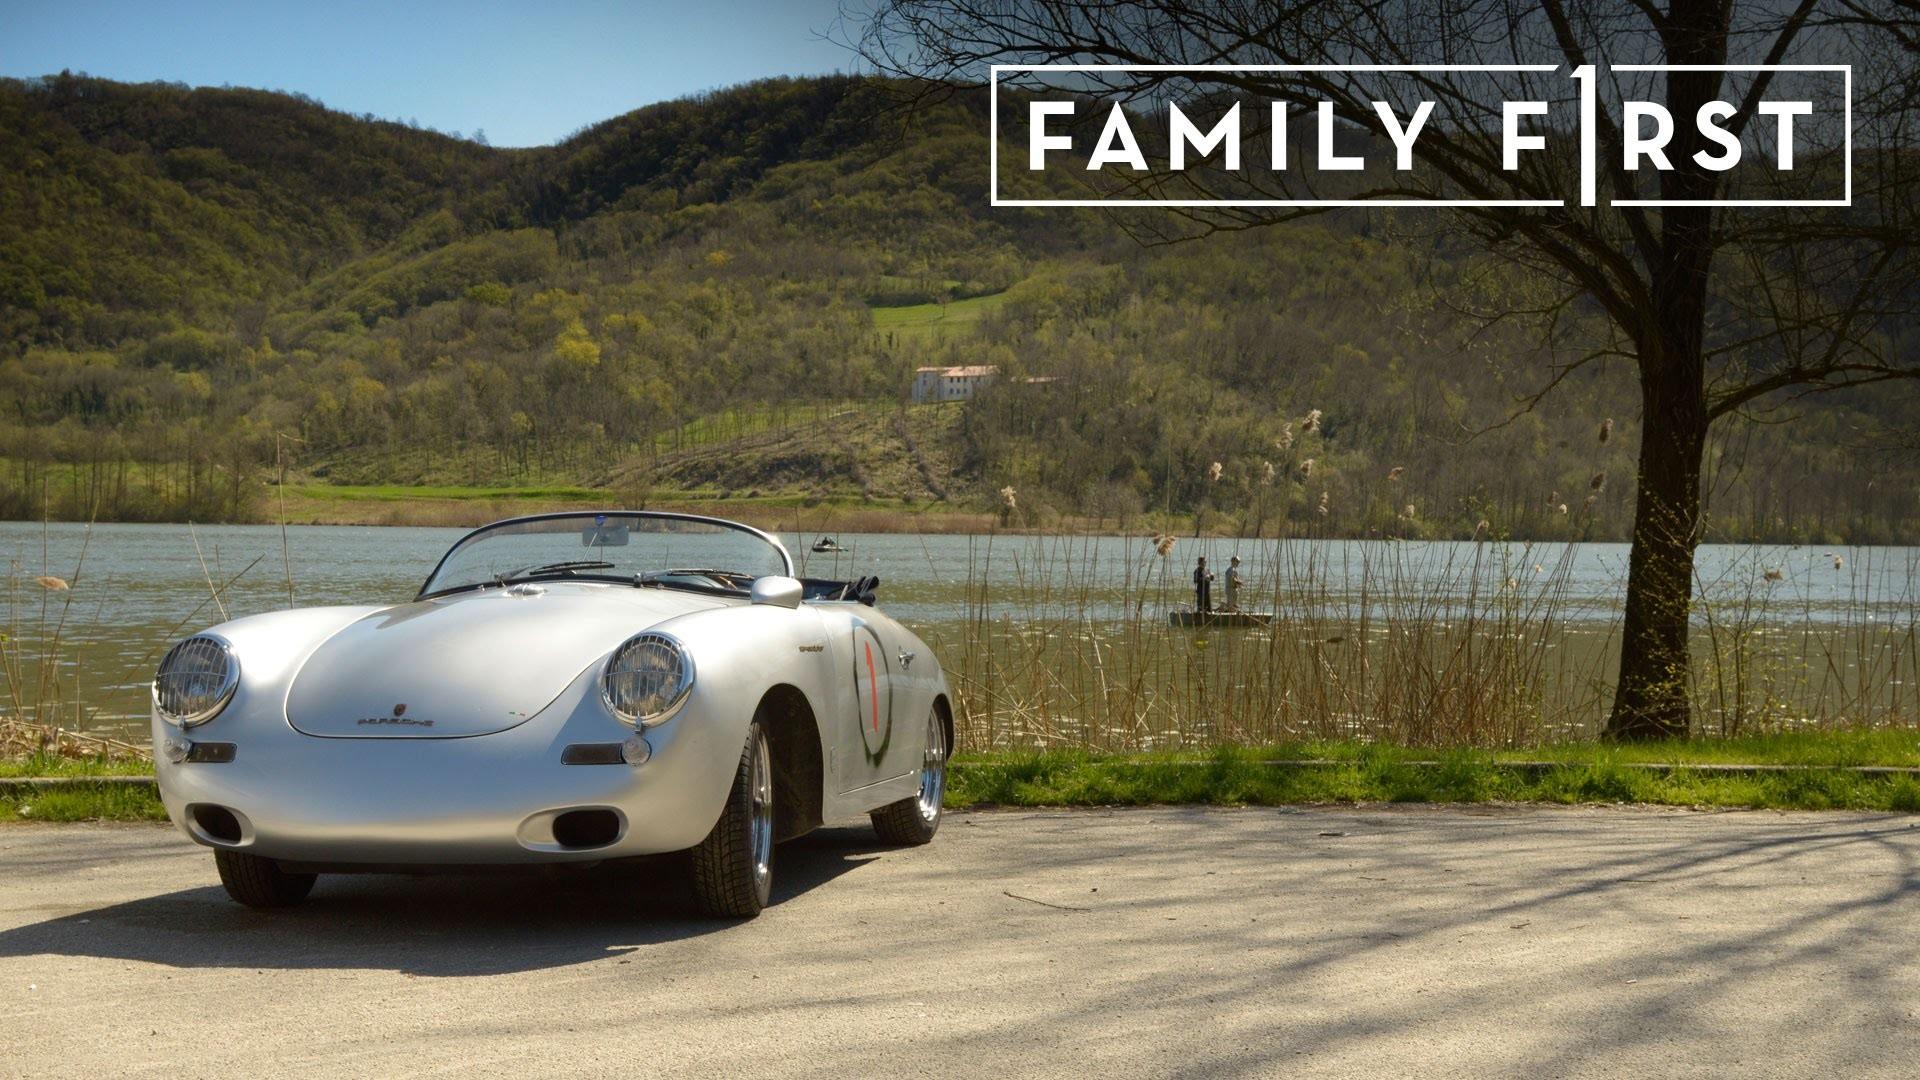 Porsche 356 Wallpaper 76 Images